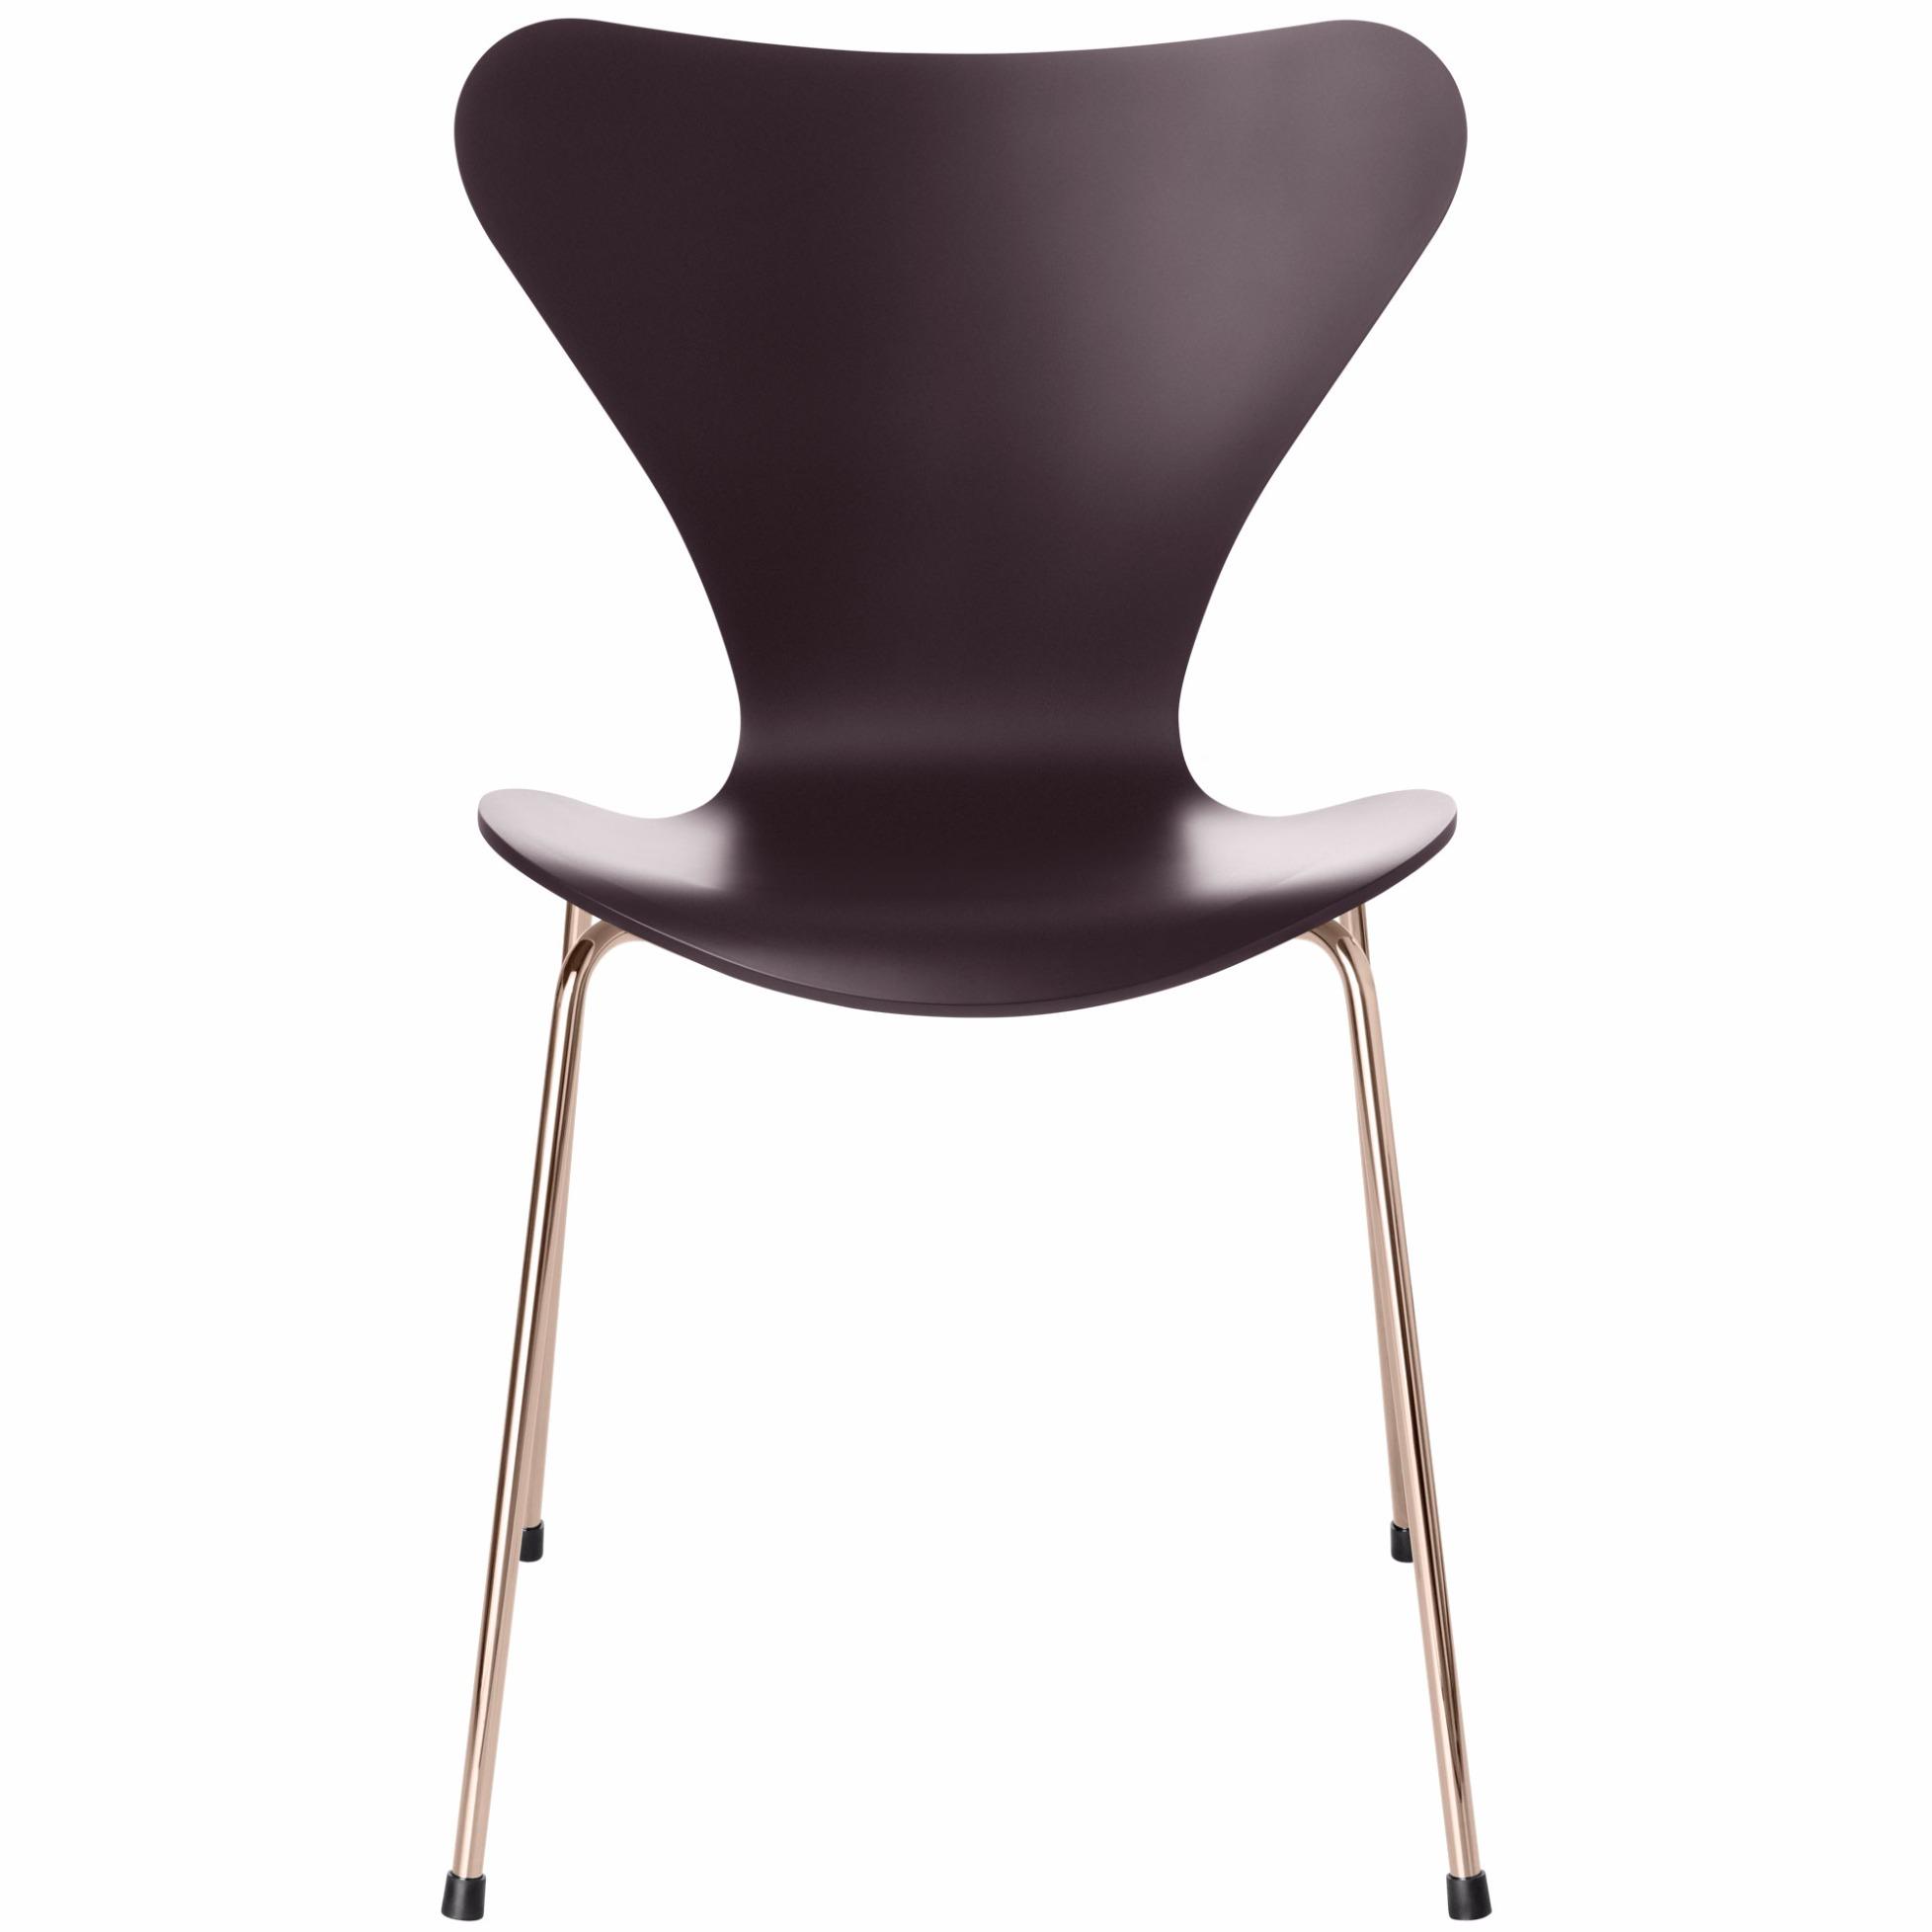 serie 7 stuhl 3107 fritz hansen 39 s choice. Black Bedroom Furniture Sets. Home Design Ideas